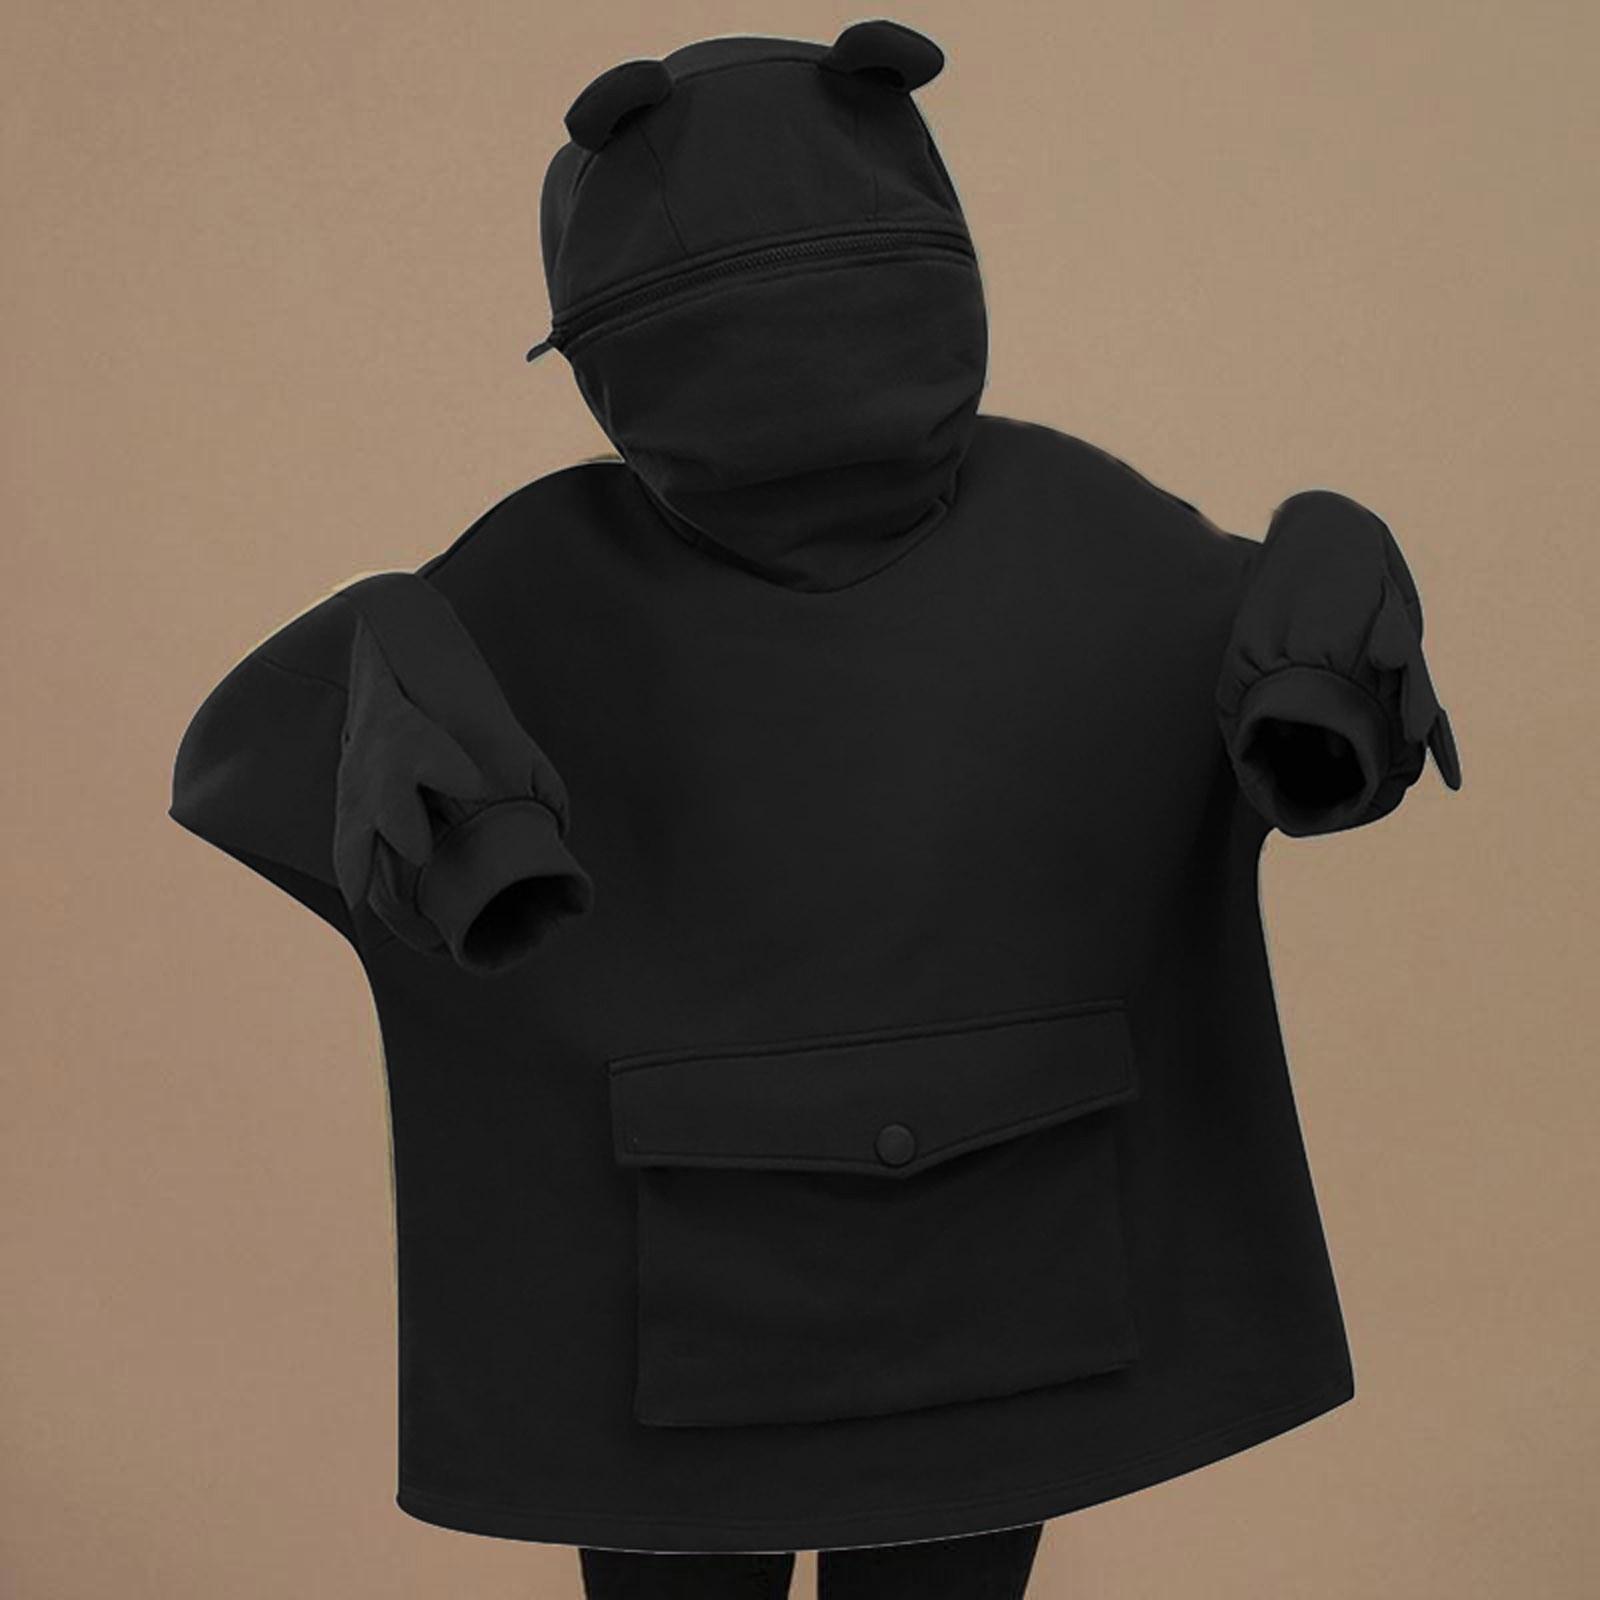 Oversized Hoodie Women Streetwear Casual Frog Printed Sweatshirt Women Winter Clothes Pullovers Tops Ropa De Mujer 2021